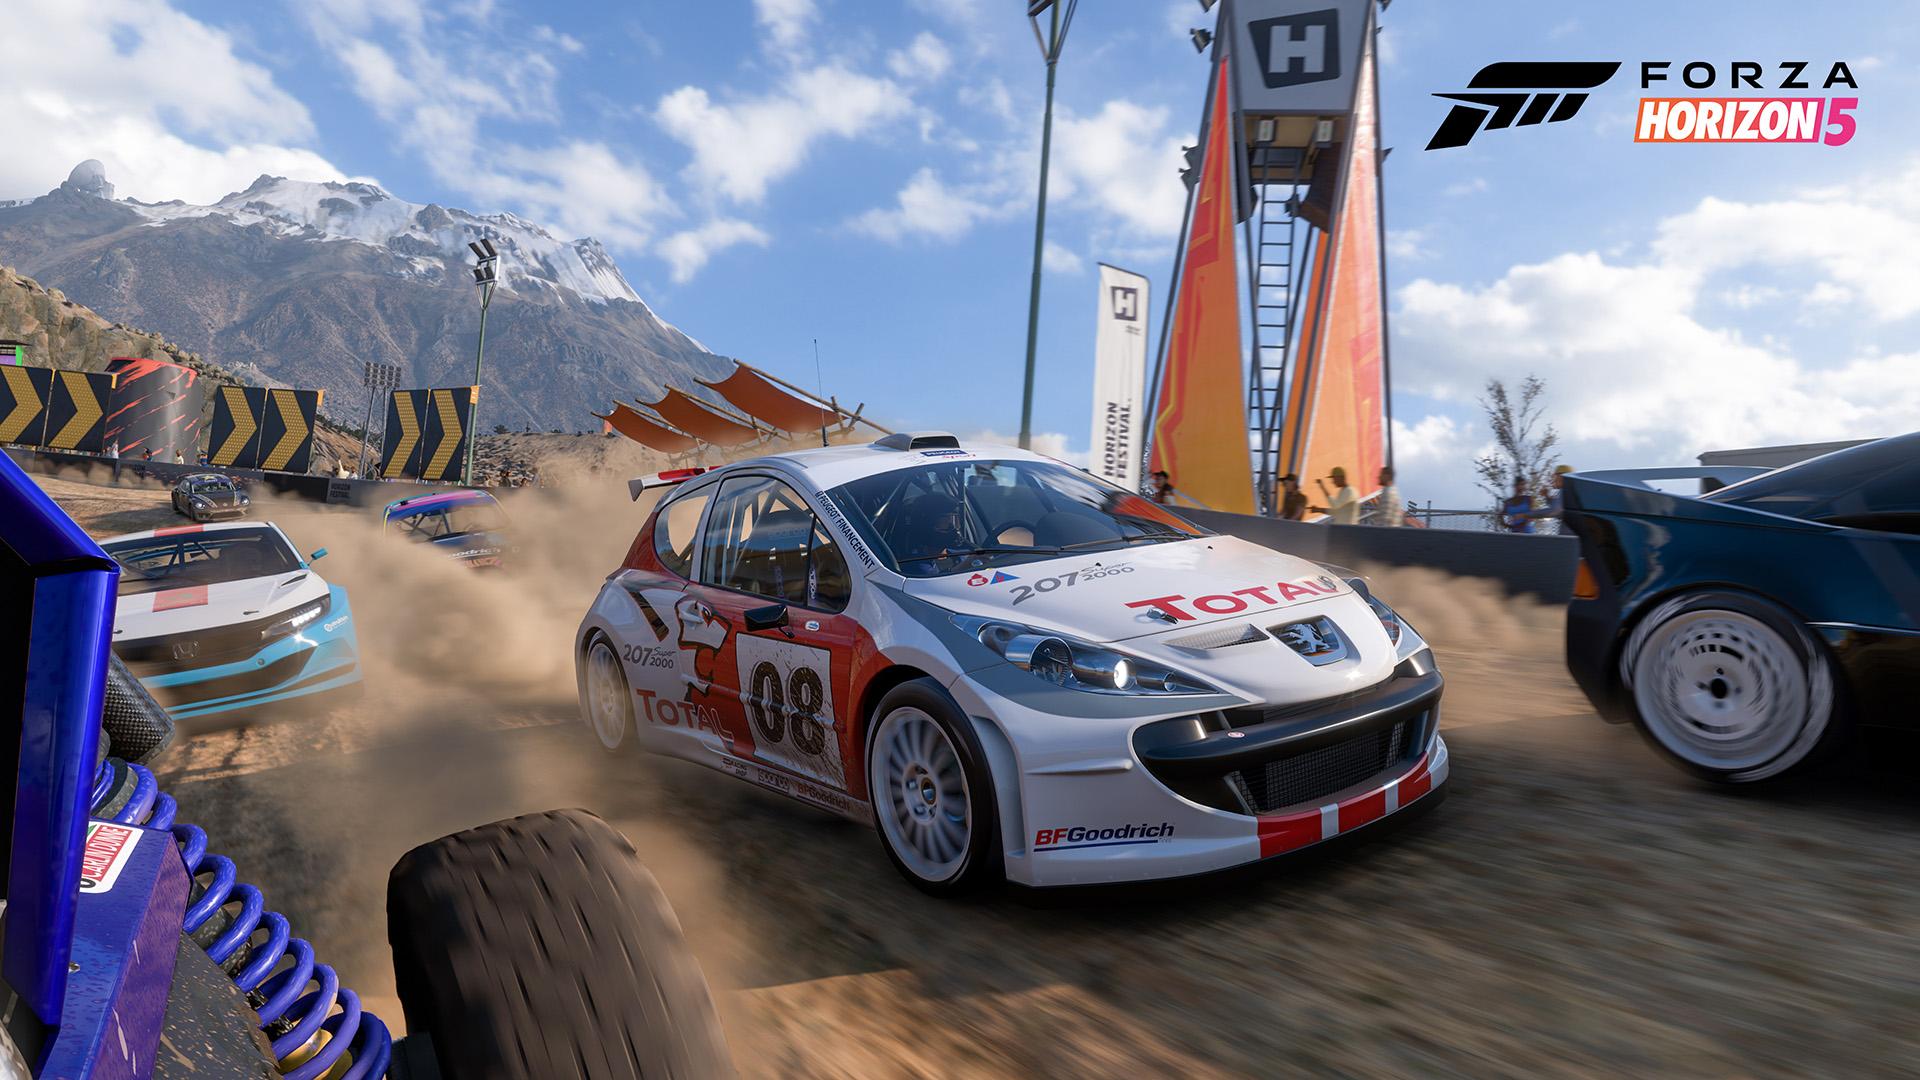 Forza Horizon 5 cars blasts through a sandy biome